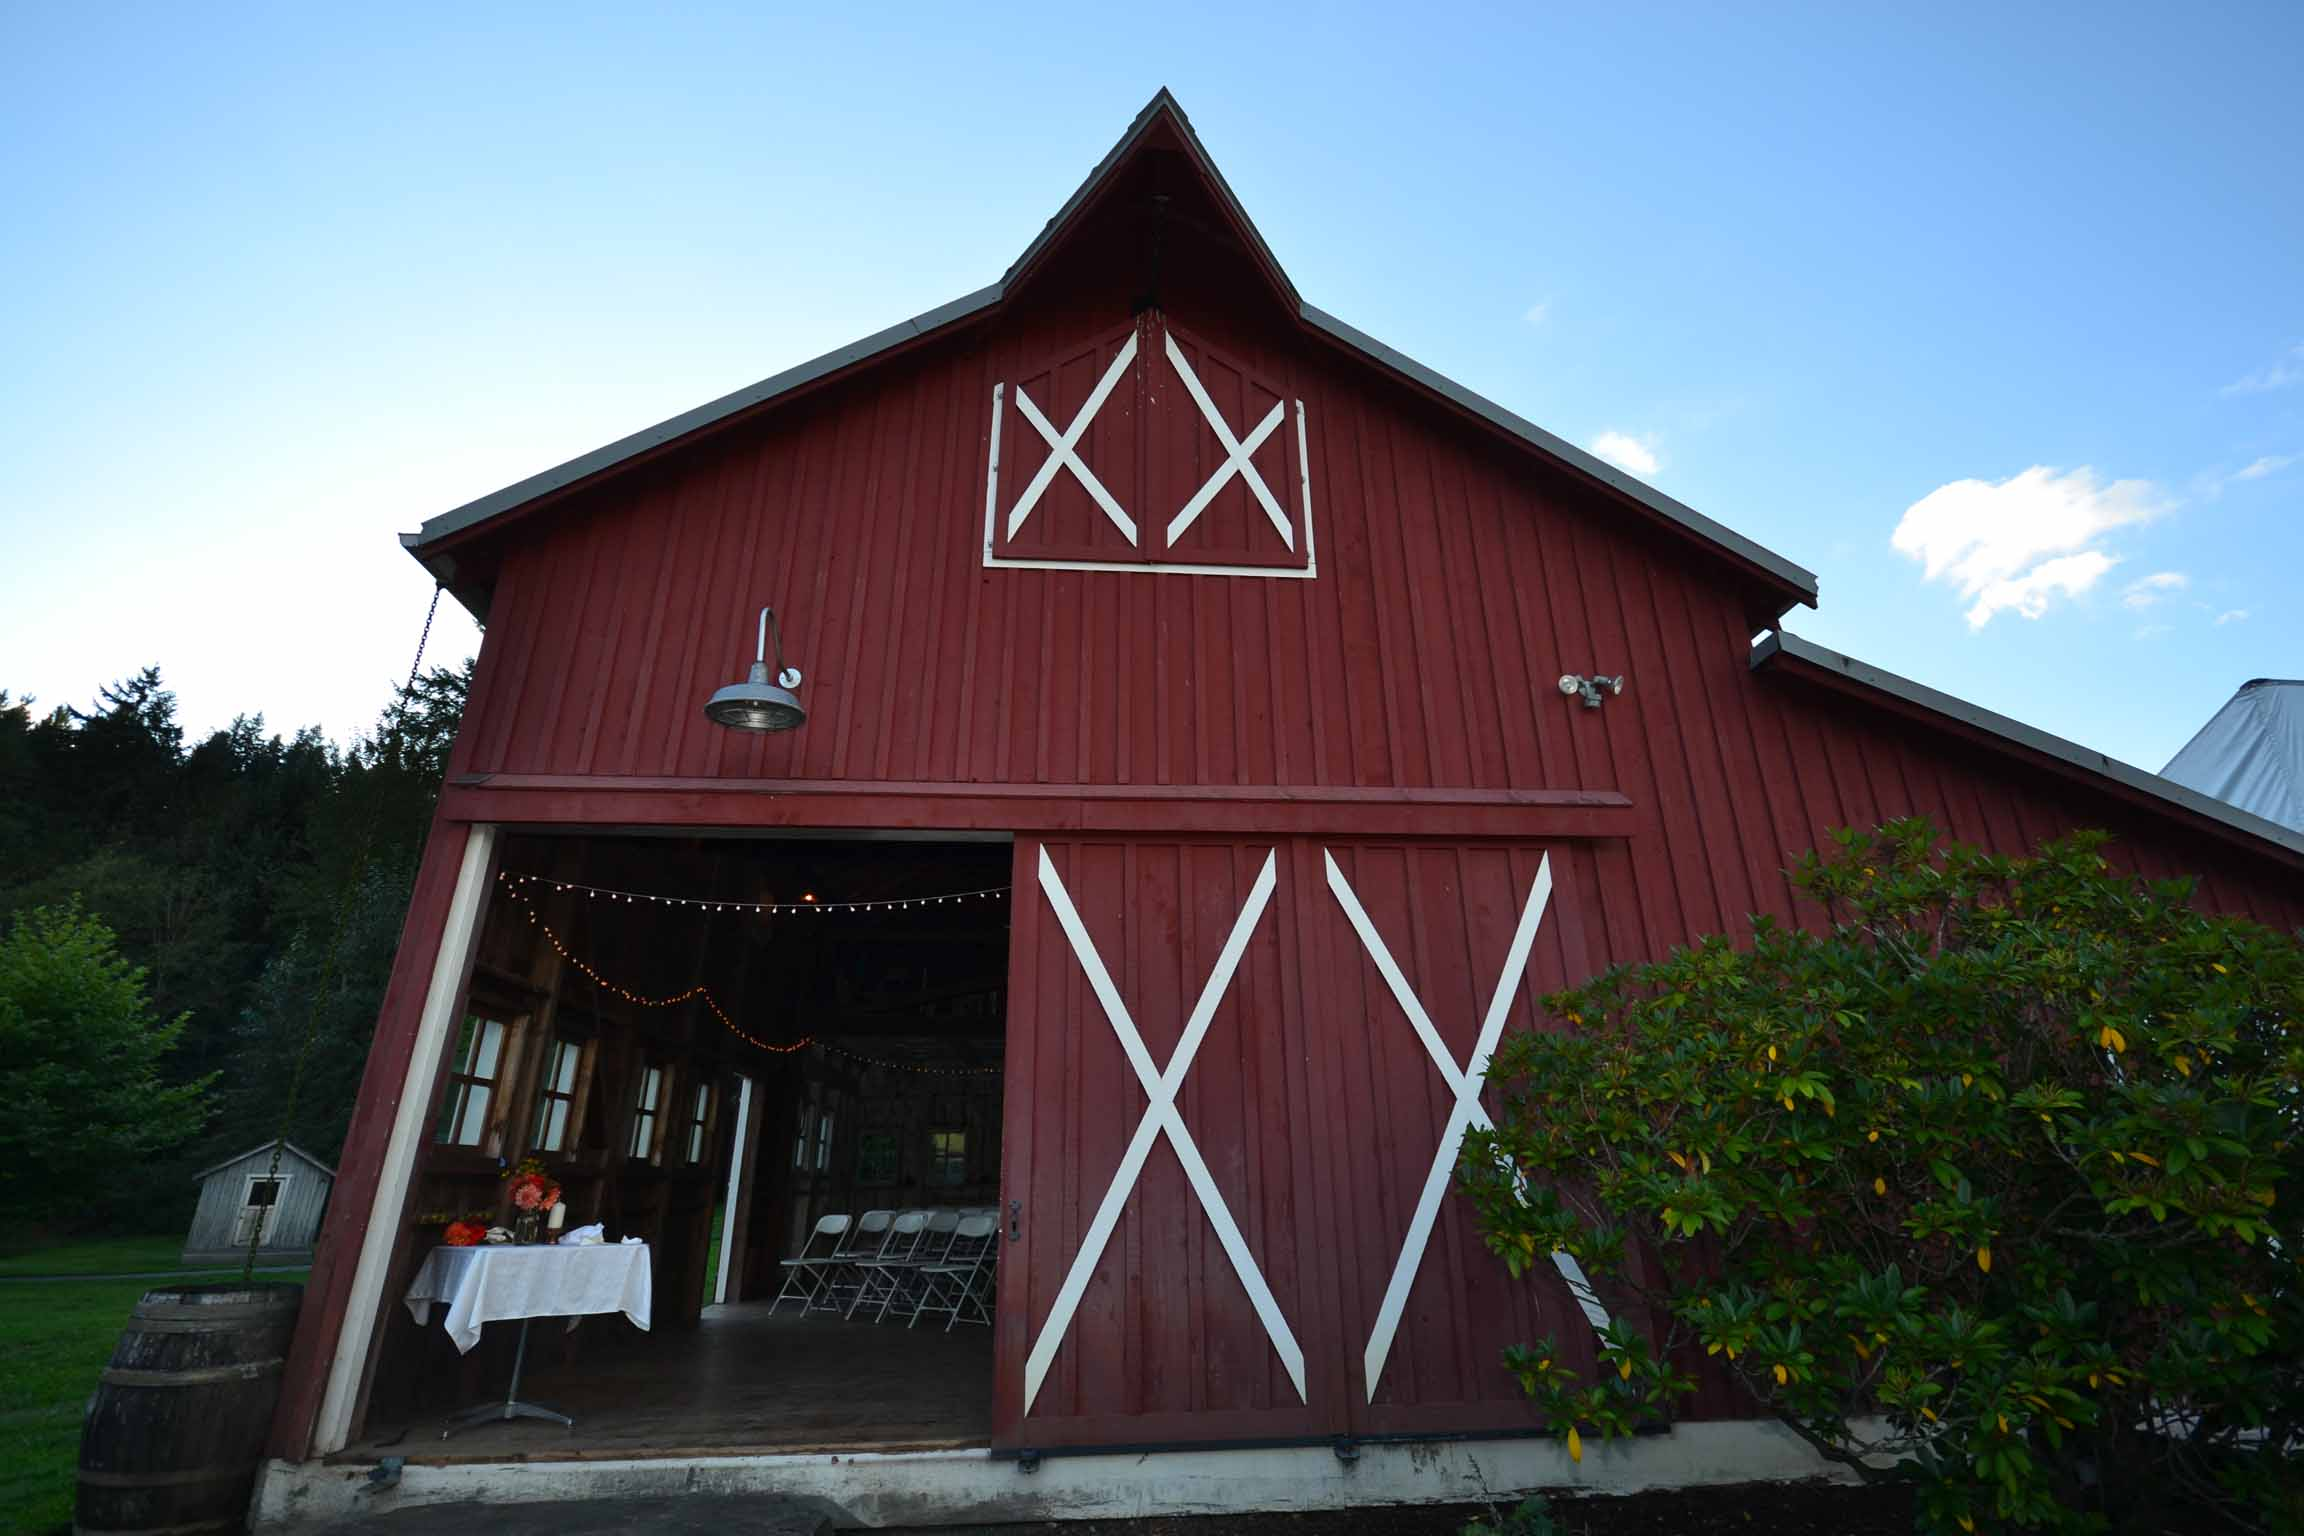 storybook farm - photo #6